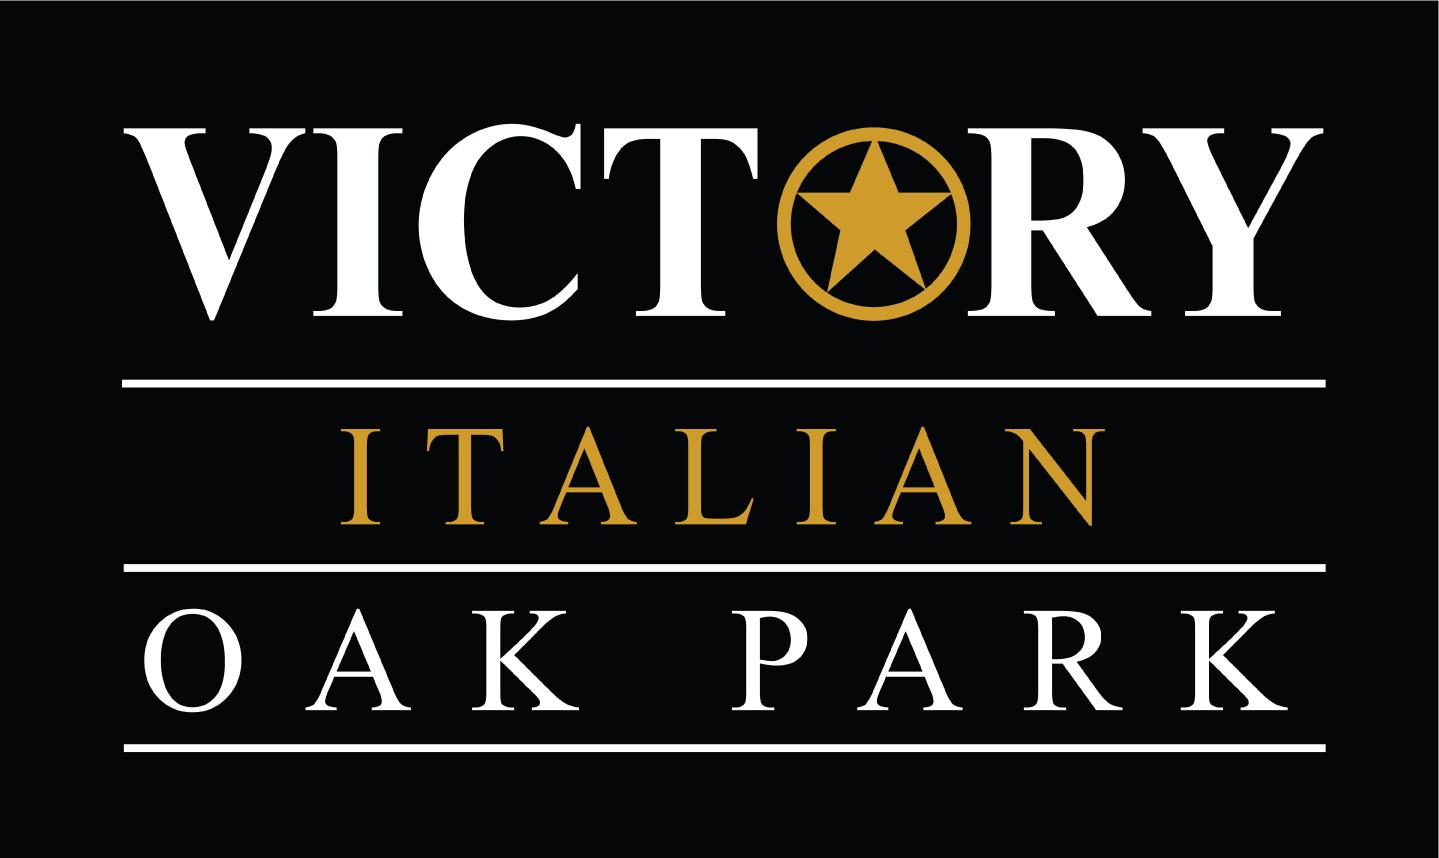 Victory Italian Oak Park